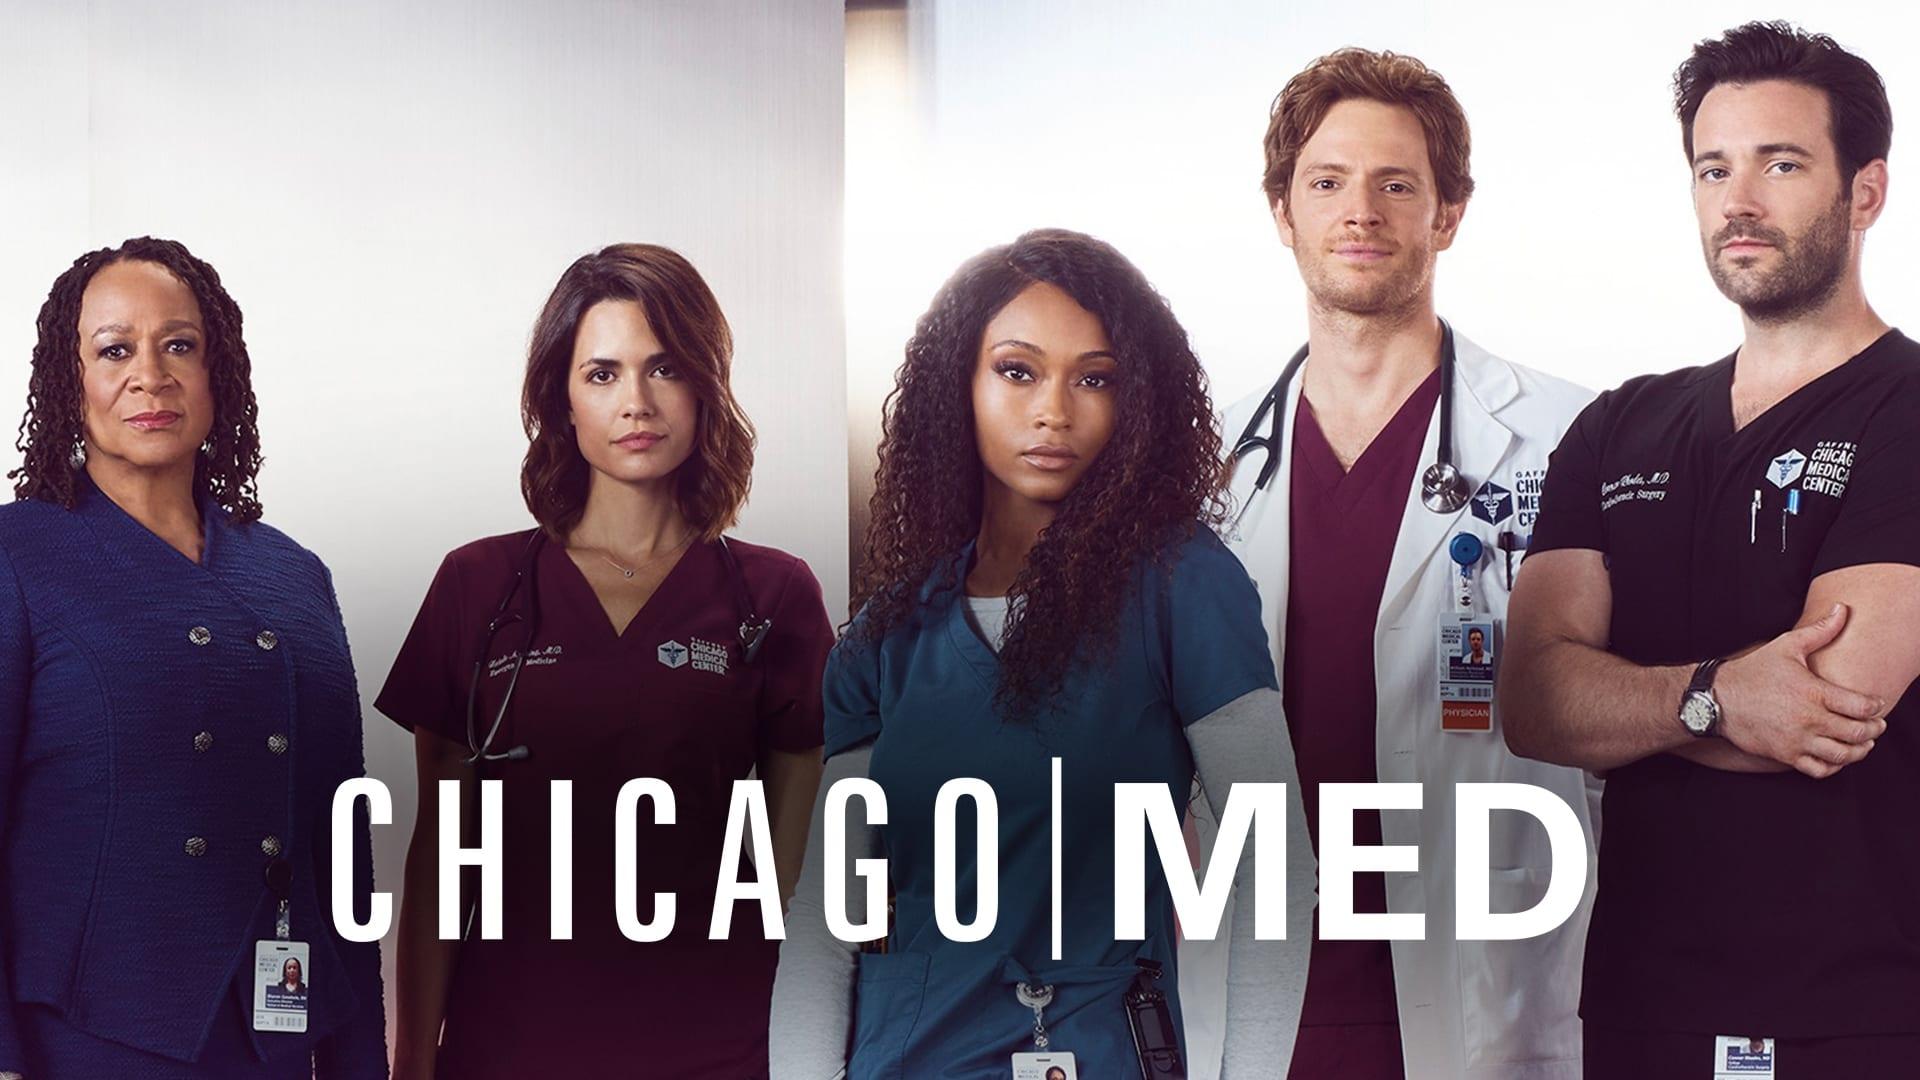 chicago med season 5 episode 4 \u0027infection, part ii\u0027, watch Torrey Devitto Movies And Tv Shows